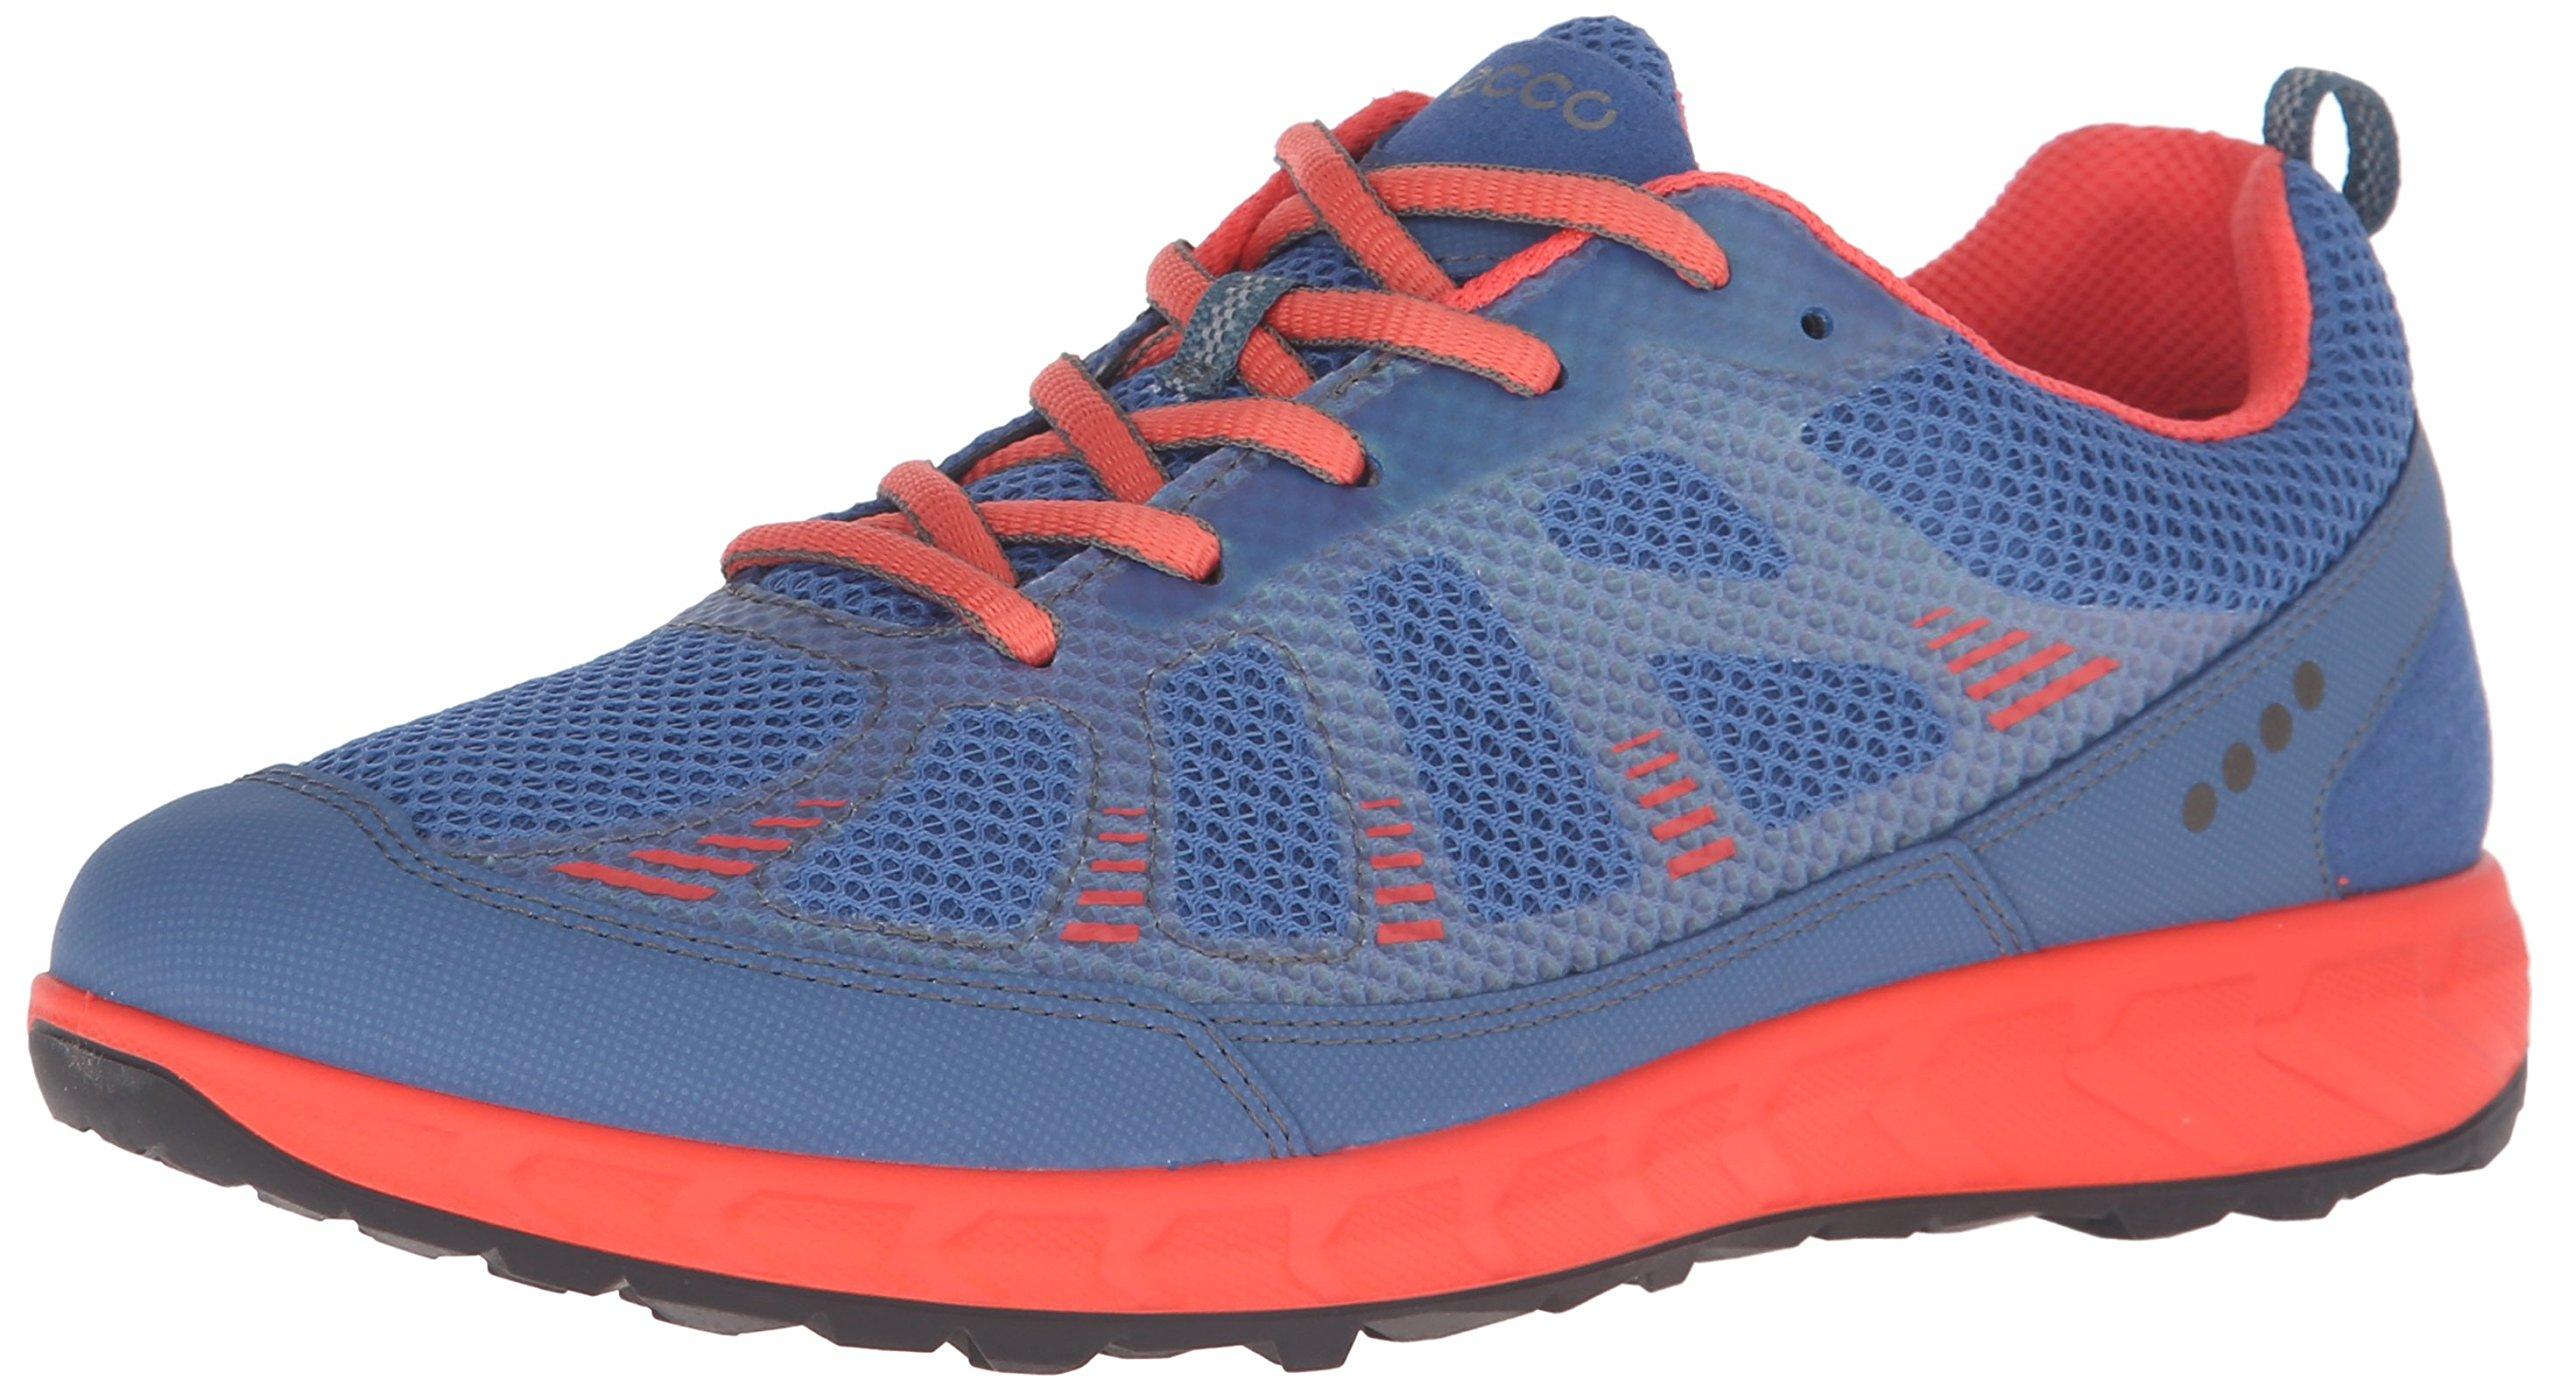 ECCO Women's Terratrail Running, Cobalt/Coral Blush, 39 EU/8-8.5 M US